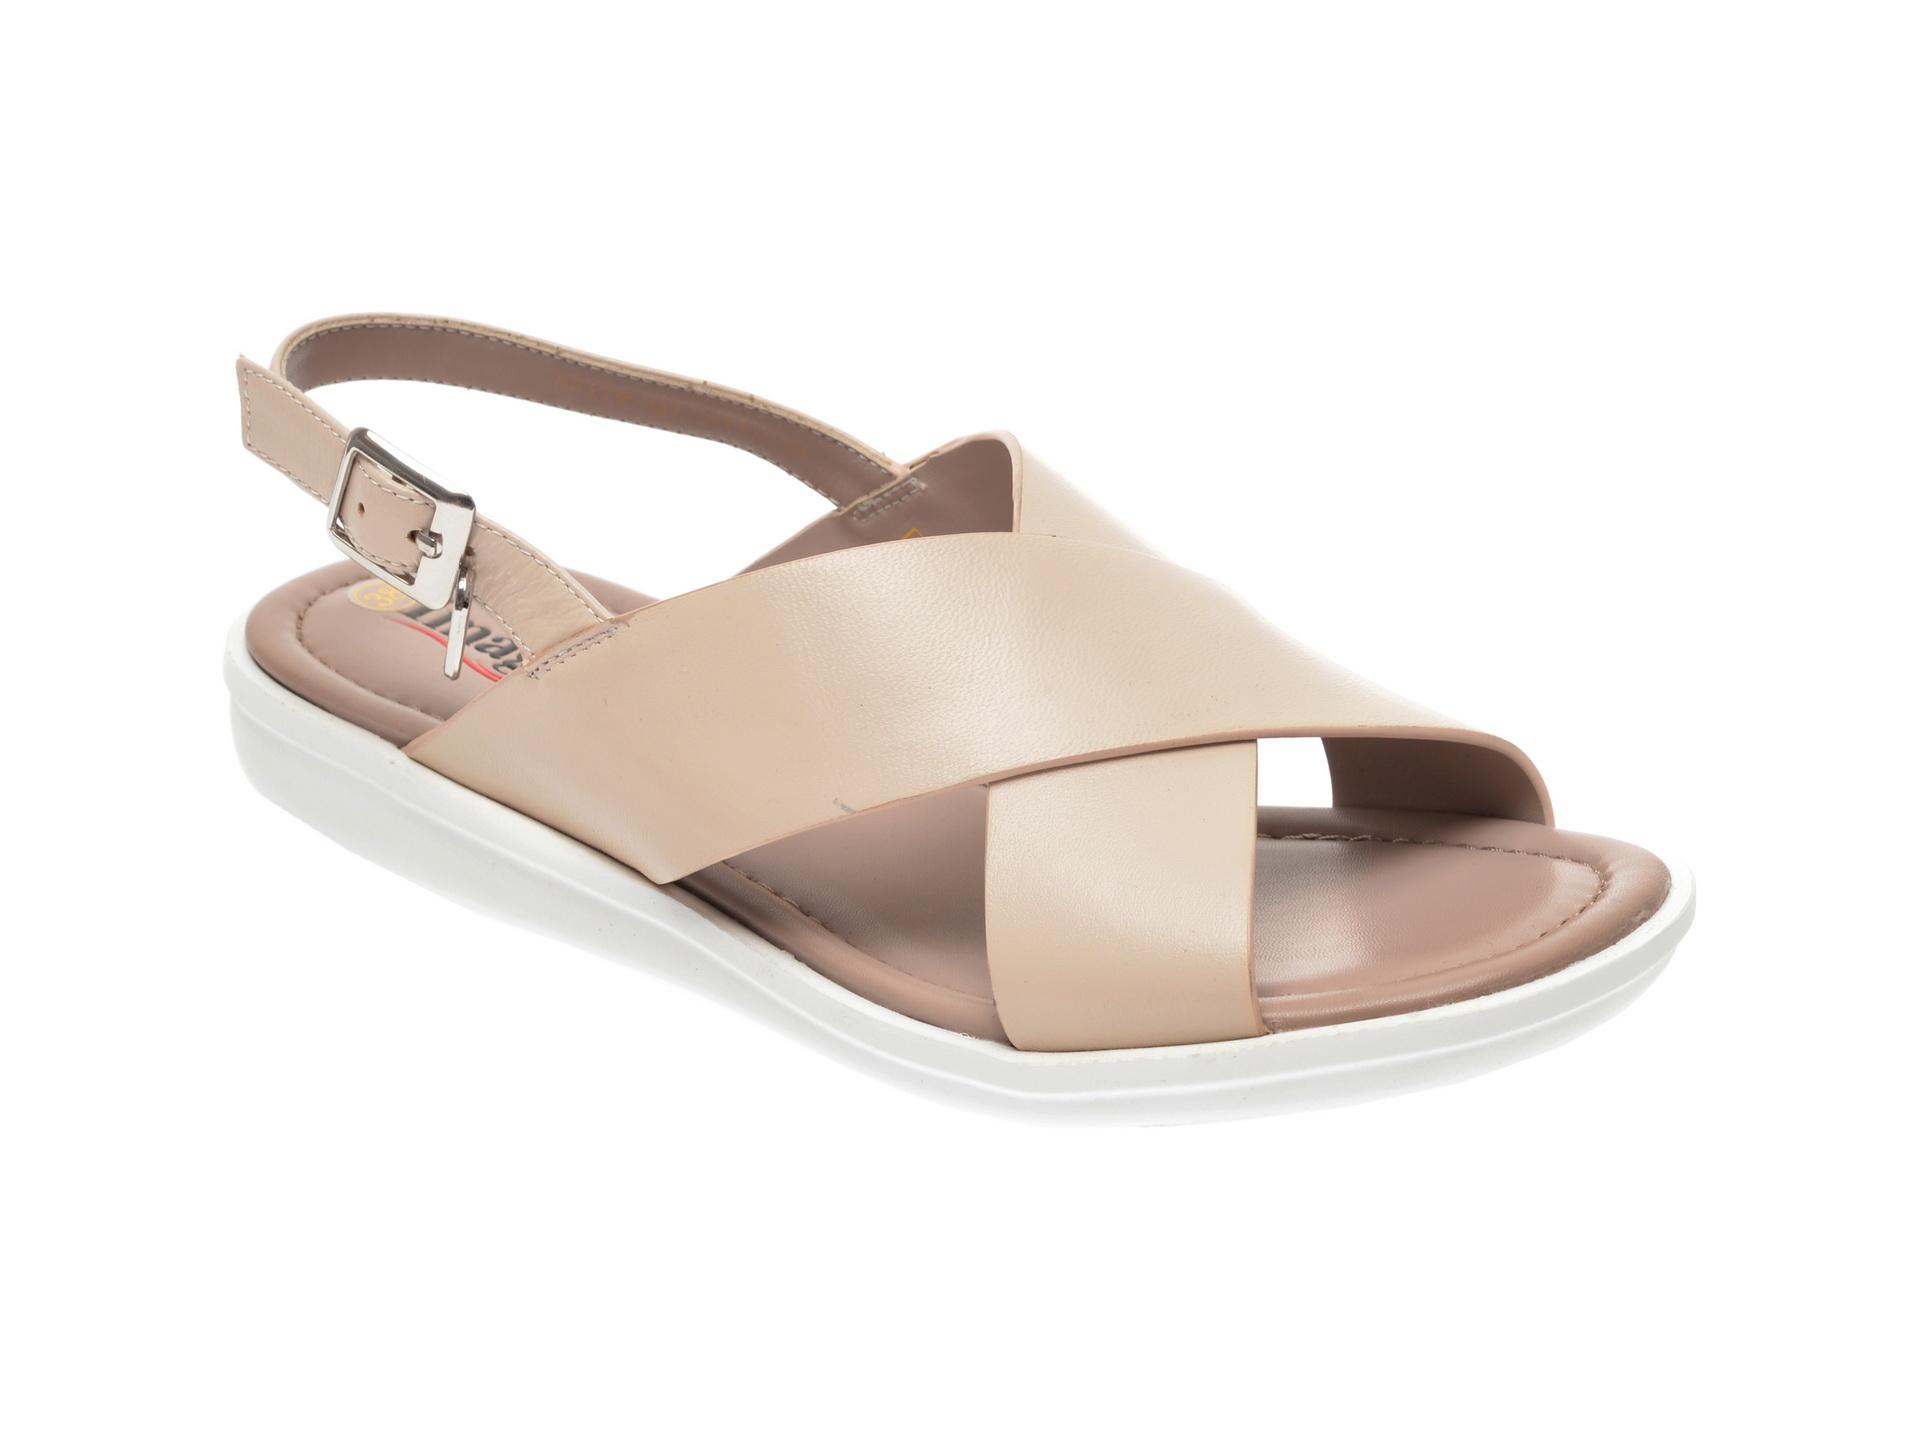 Sandale IMAGE bej, 82179Q1, din piele naturala